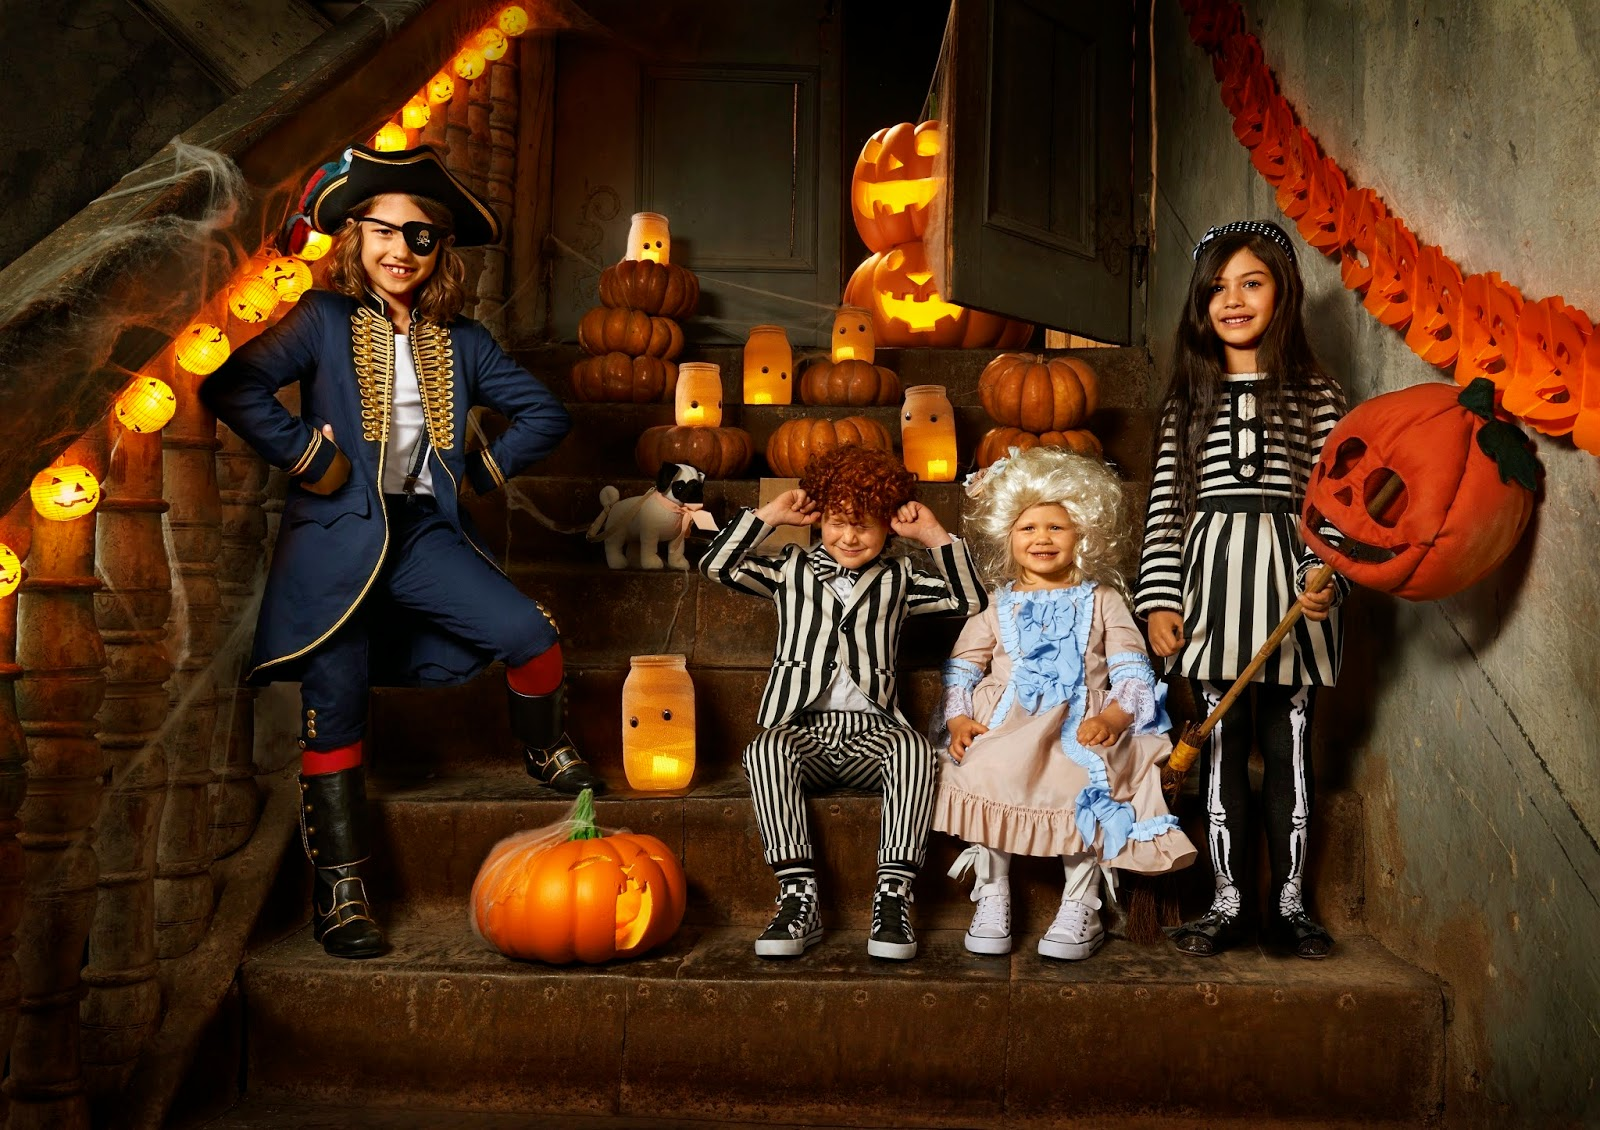 Конкурс на лучший костюм хэллоуина